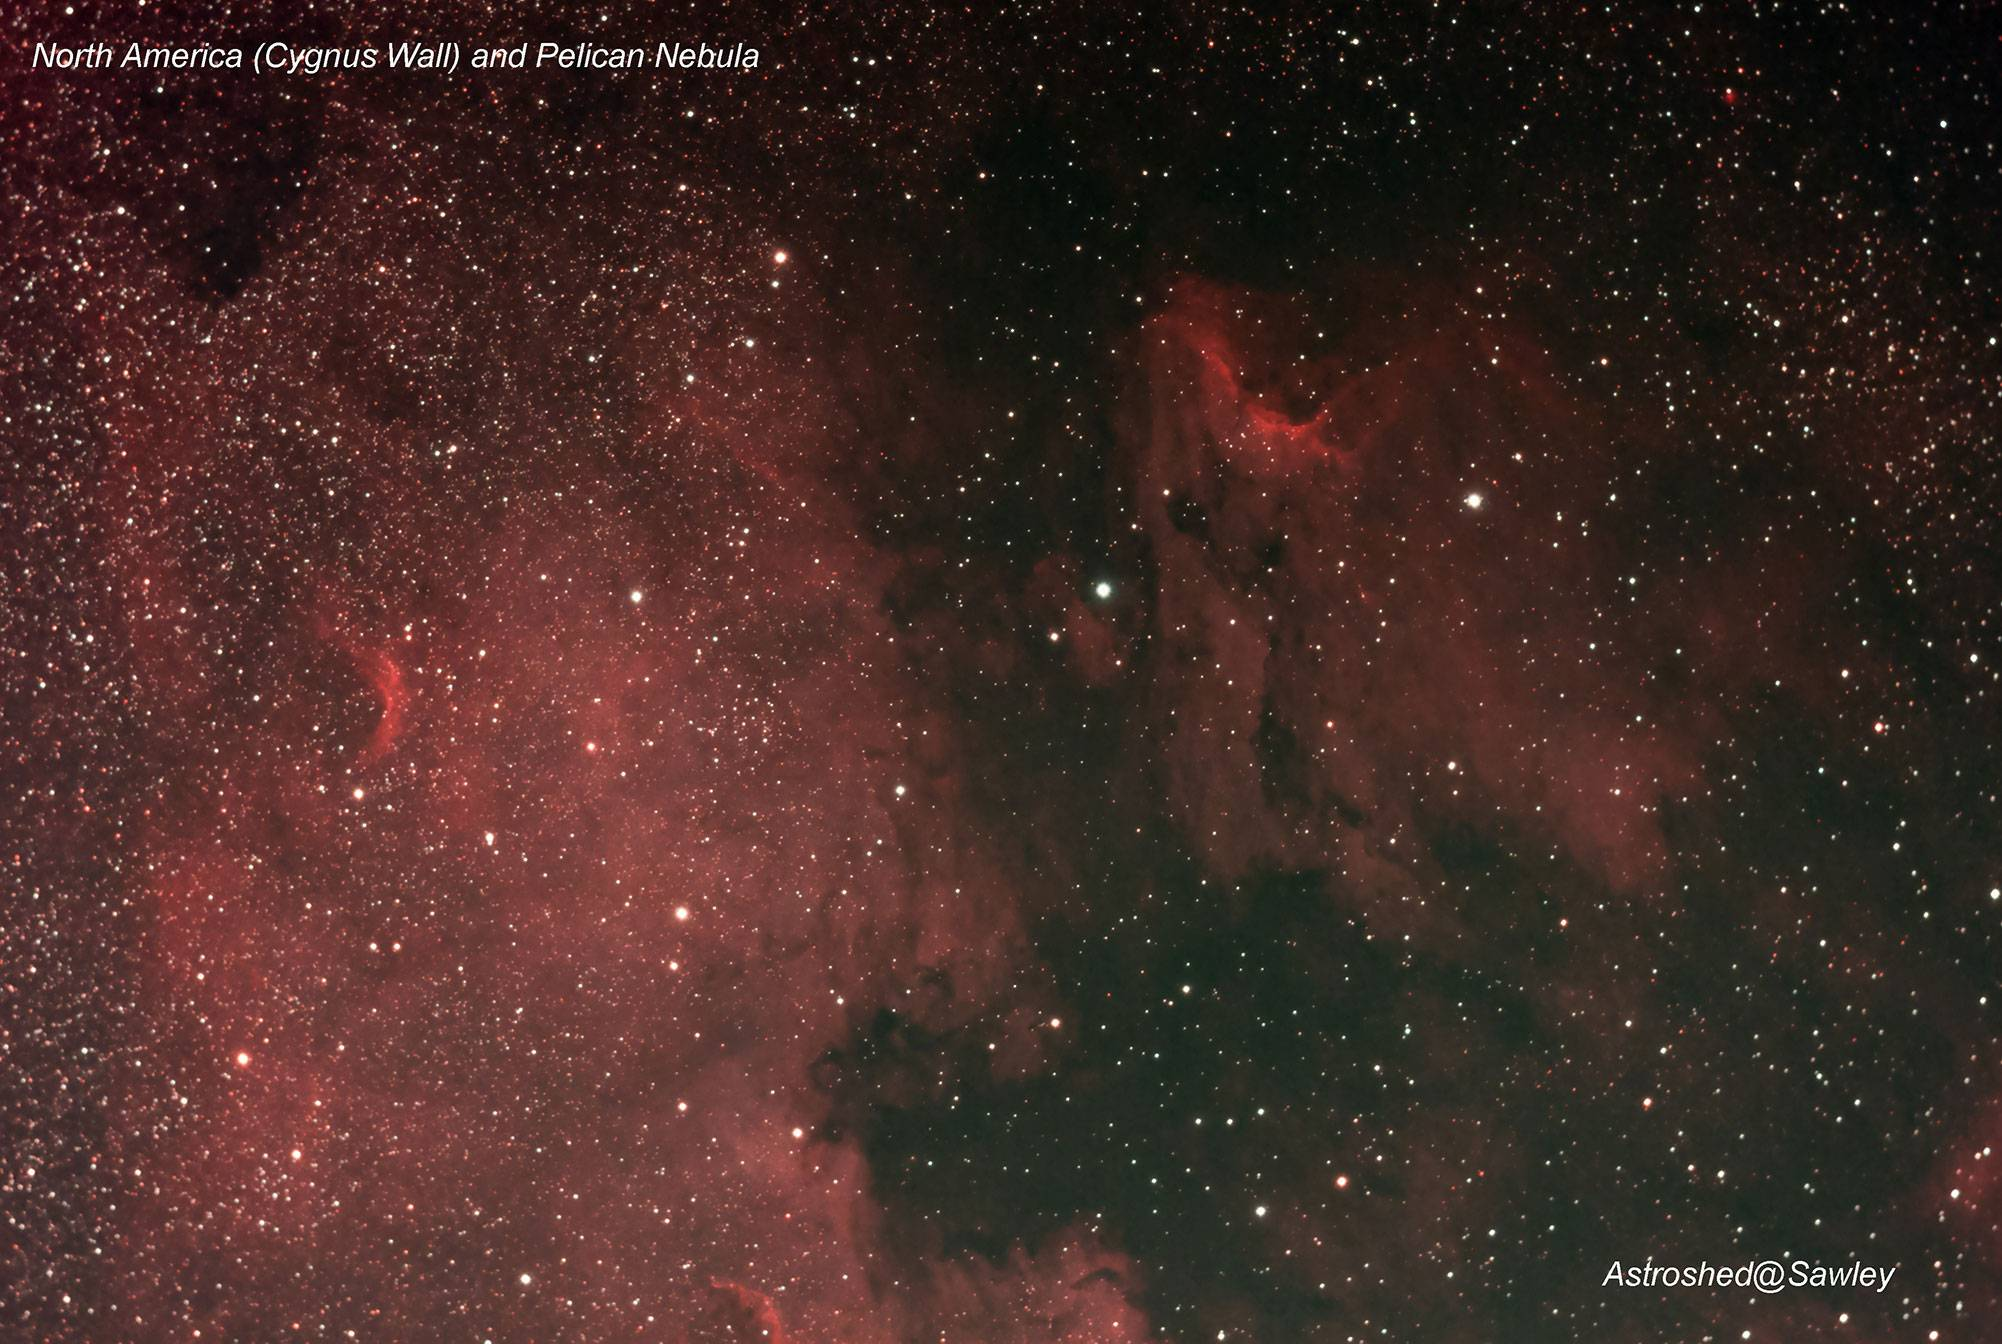 Chris's North America and Pelican Nebula